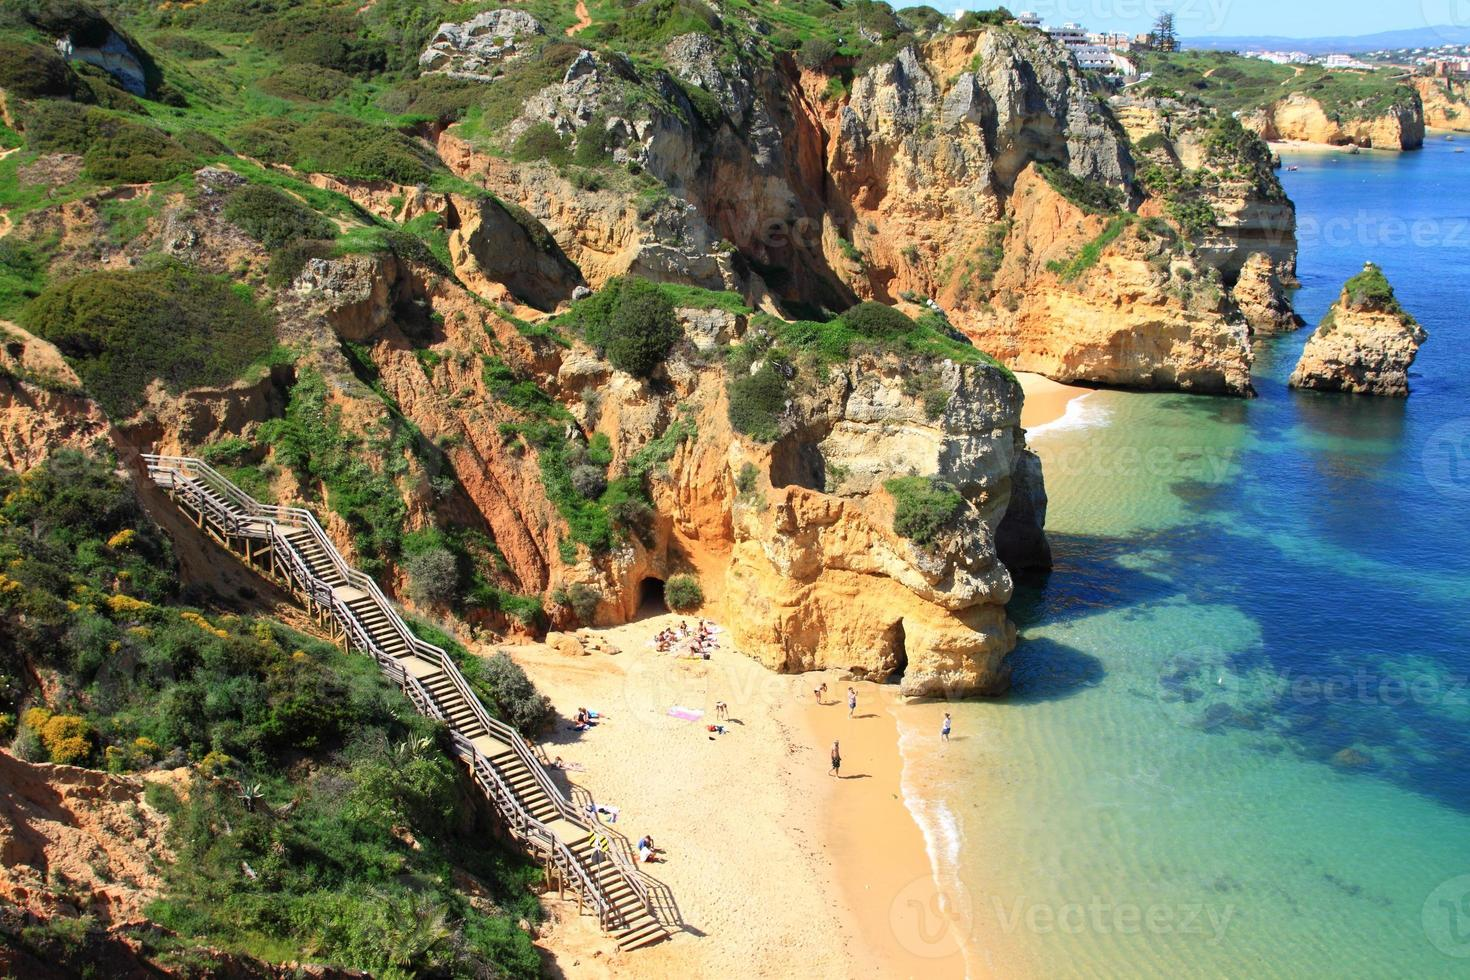 ponta de piedade in lagos, algarve kust in portugal foto